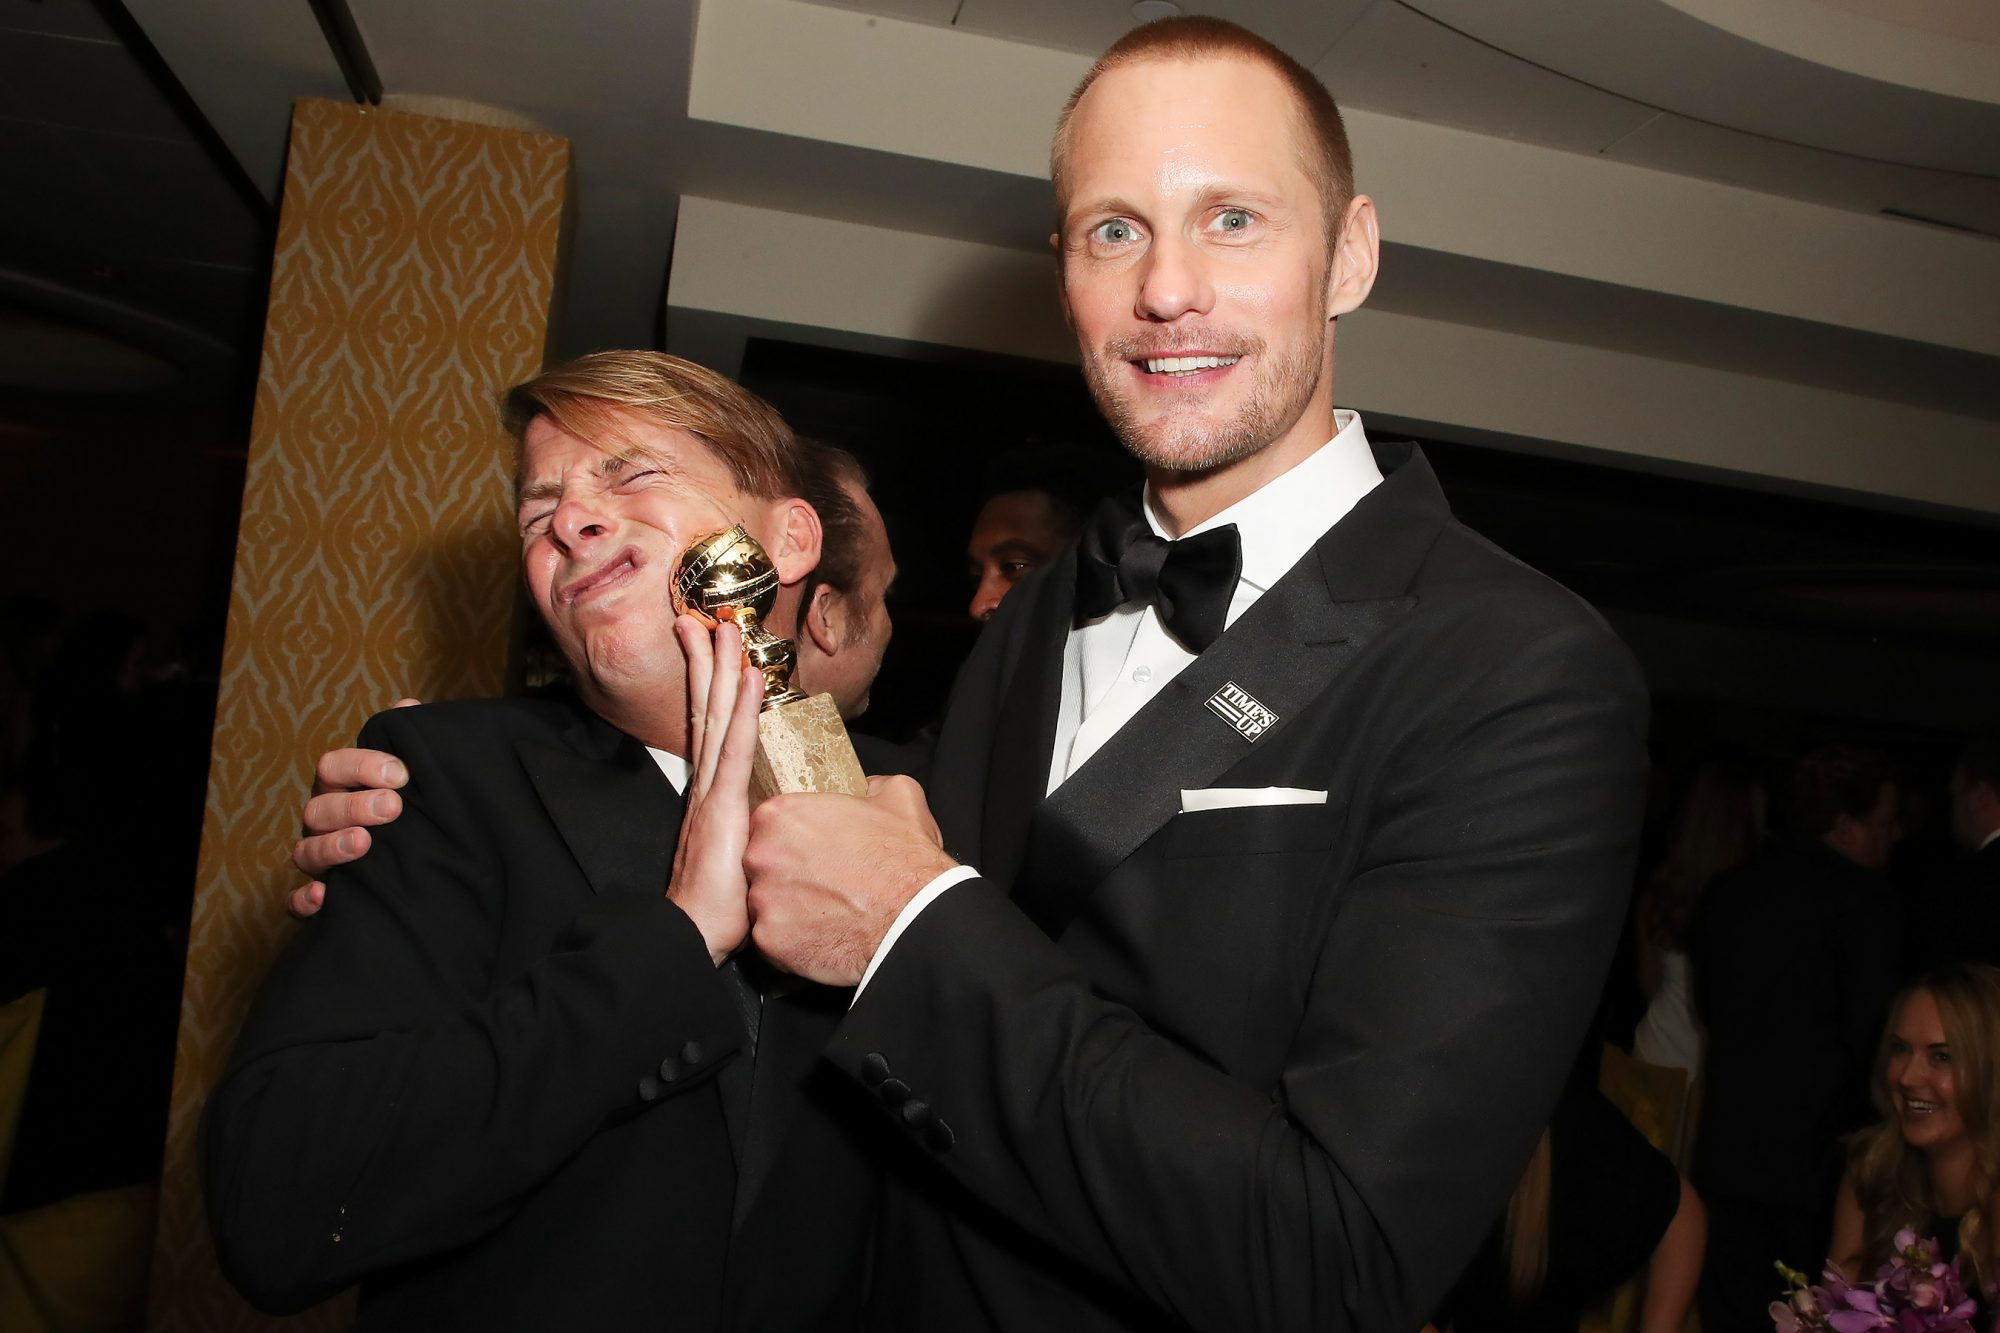 HBO Golden Globes After Party, Inside, Los Angeles, USA - 07 Jan 2018